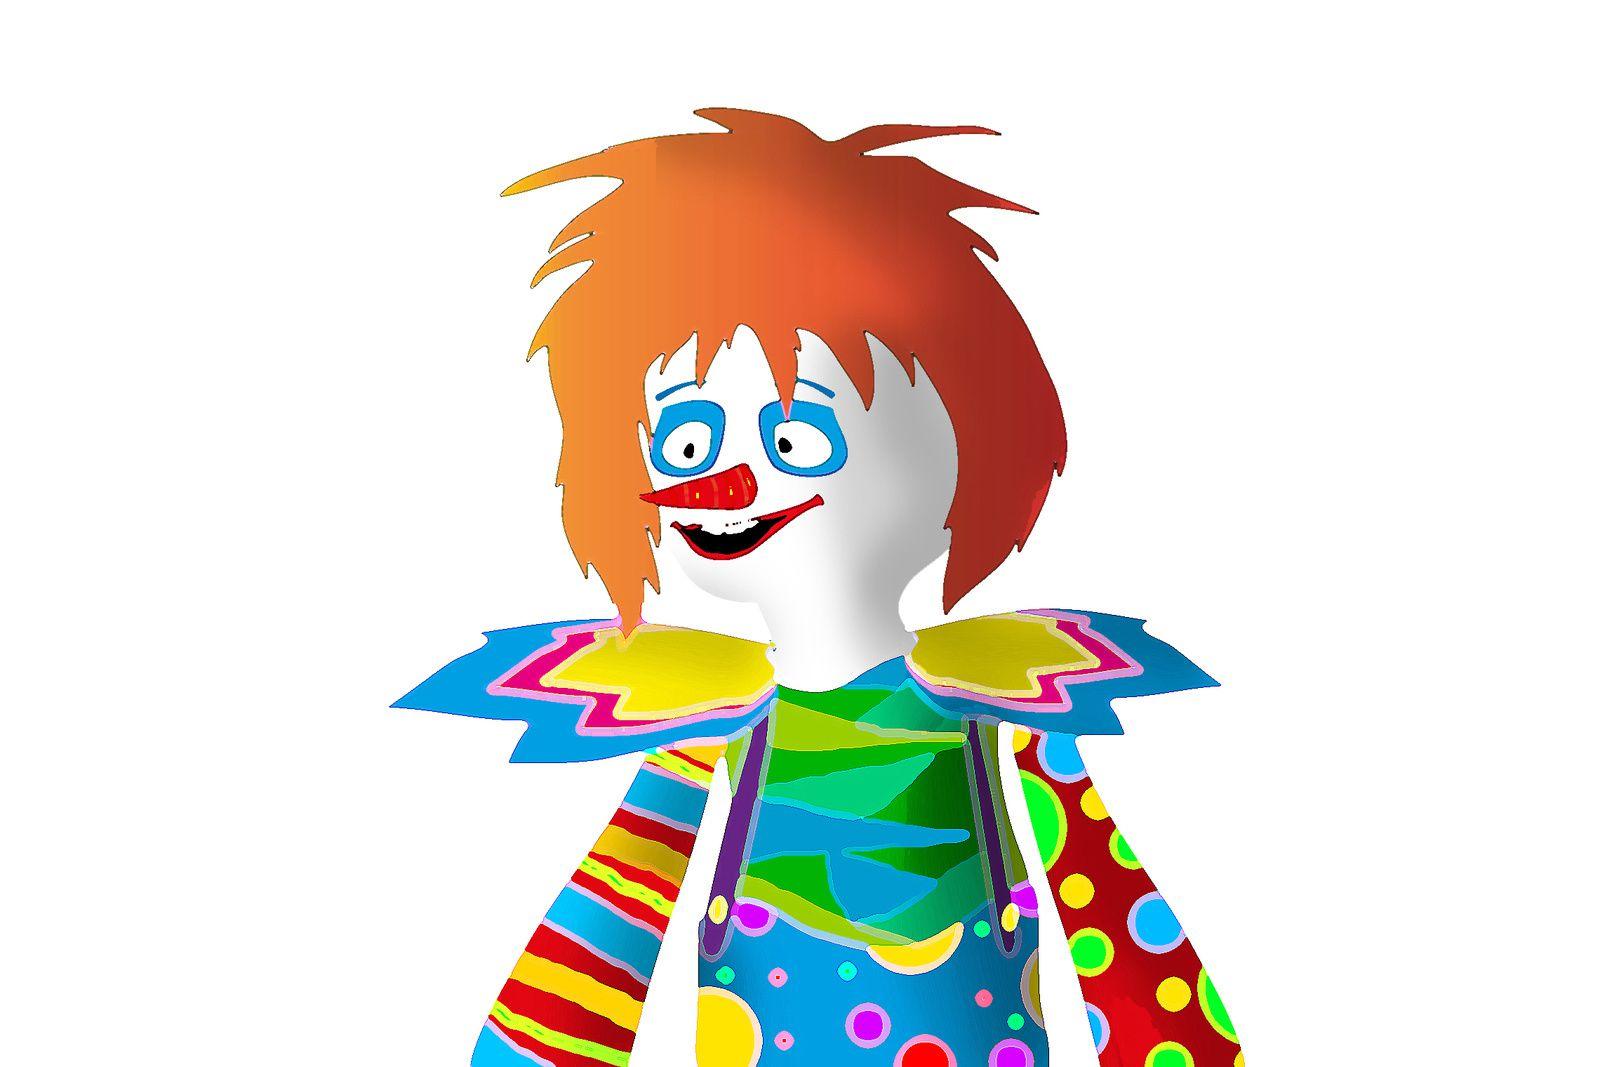 01 - Couverture 02 - Laughing Jack monochrome 03 - Laughing Jack en couleur 04 - Jeff the Killer 05 - Lyu